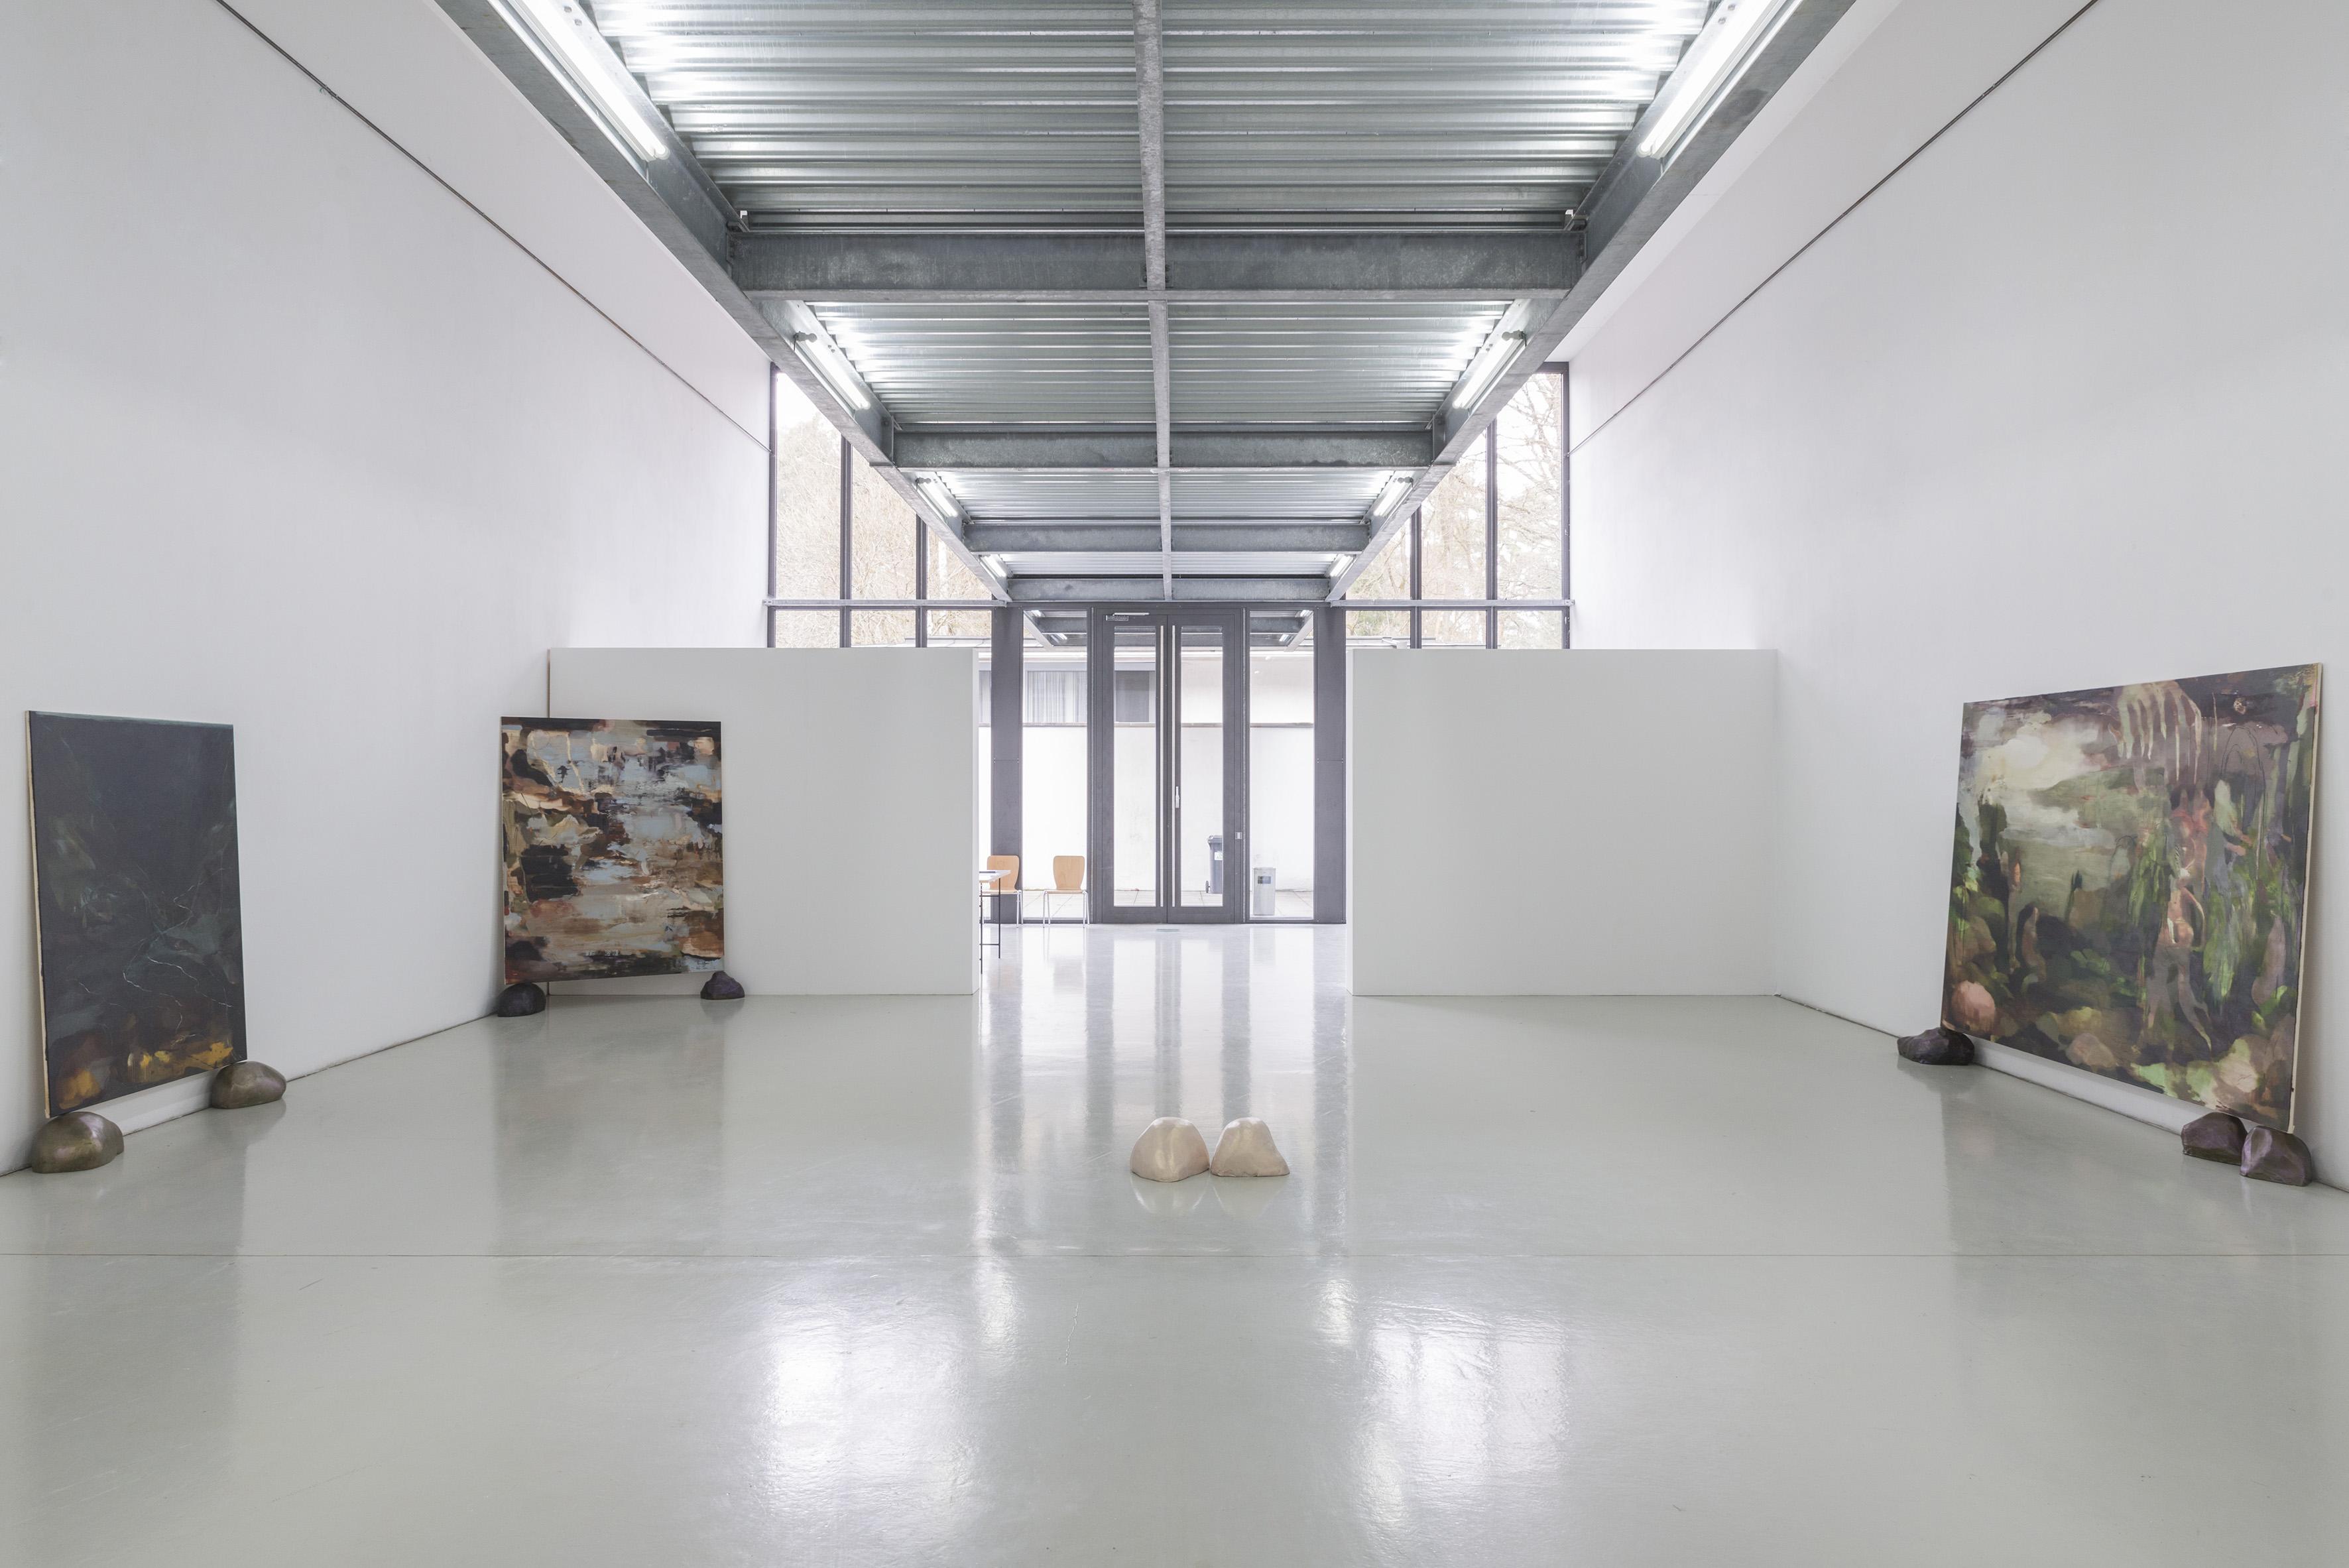 2018 DebütantInnen. A.d.B.K. Nürnberg Ausstellungshalle. 18-27 Januar 2018. Nazzarena Poli Maramotti exhibition. photo ©Masiar Pasquali